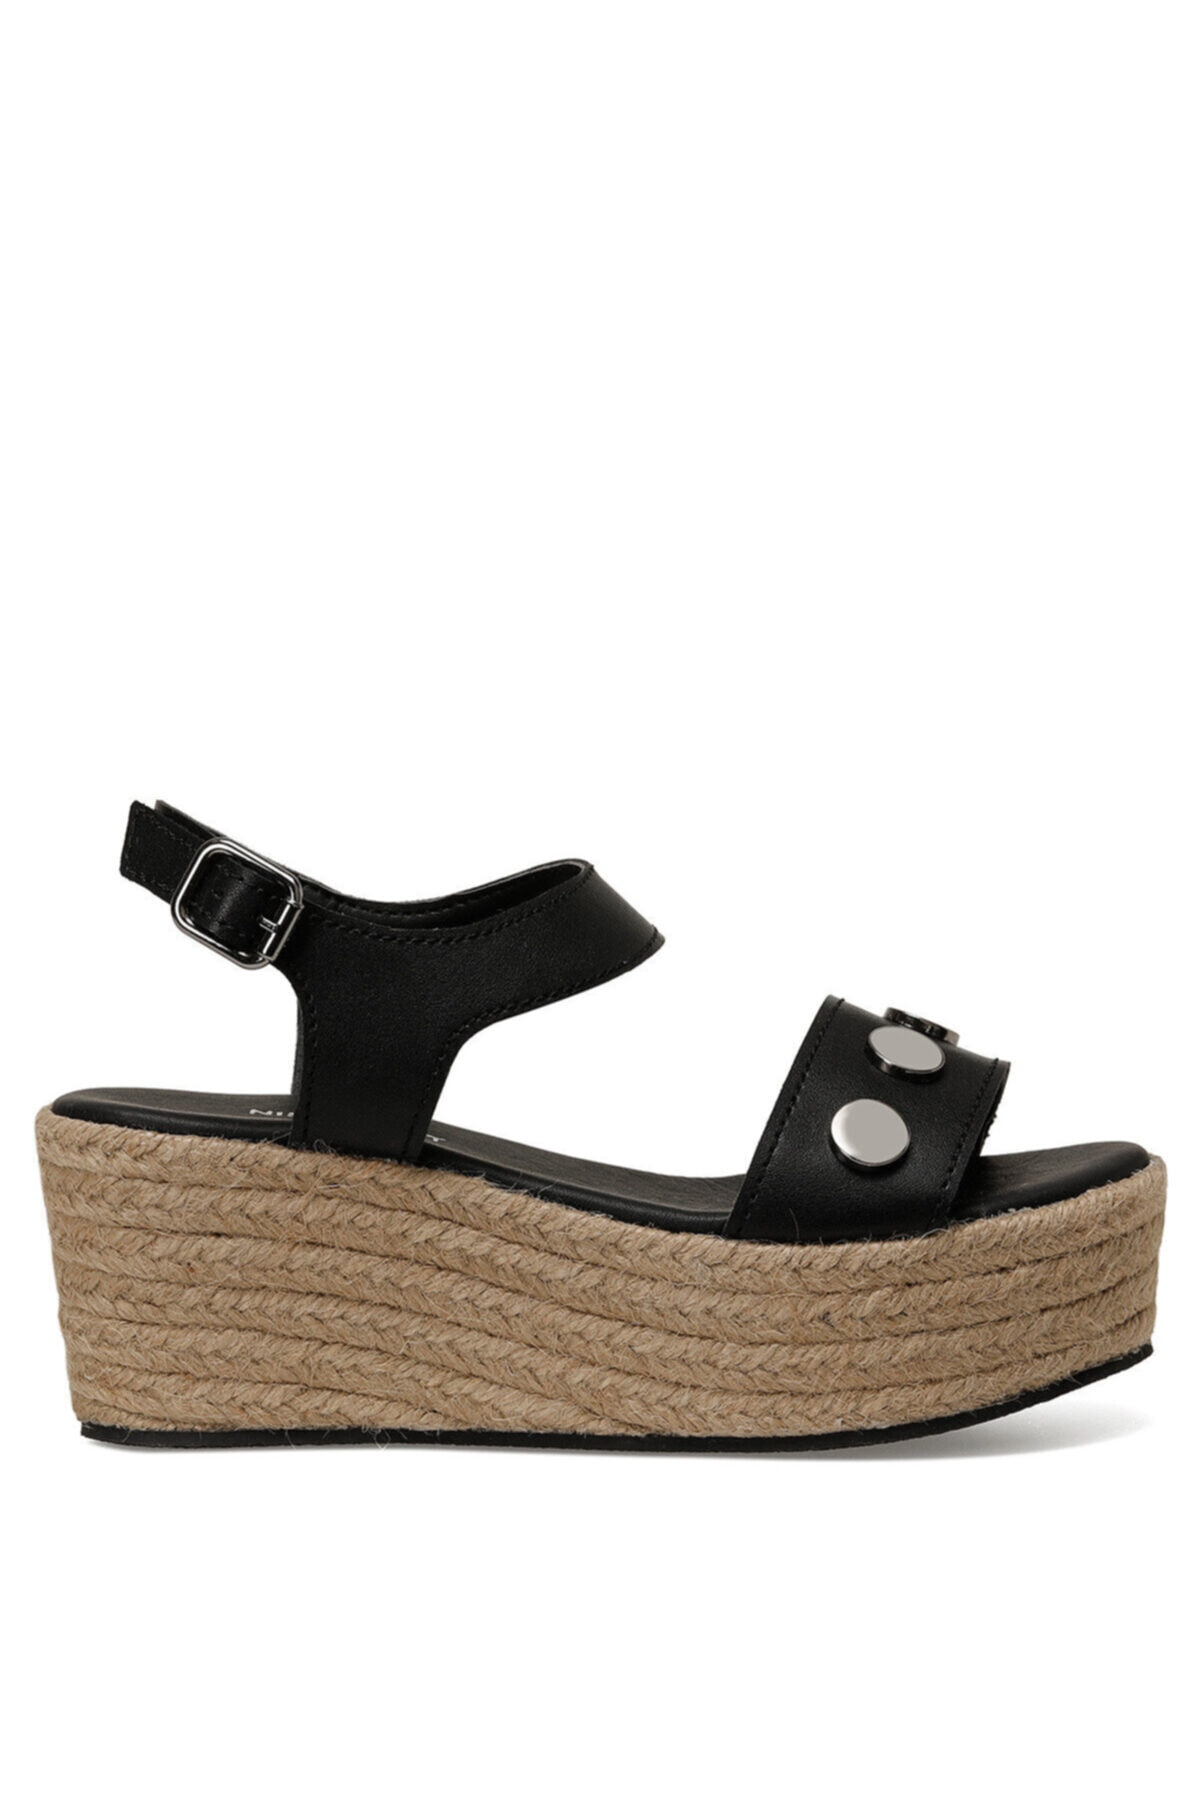 Nine West VALADON Siyah Kadın Dolgu Topuklu Sandalet 100526222 1